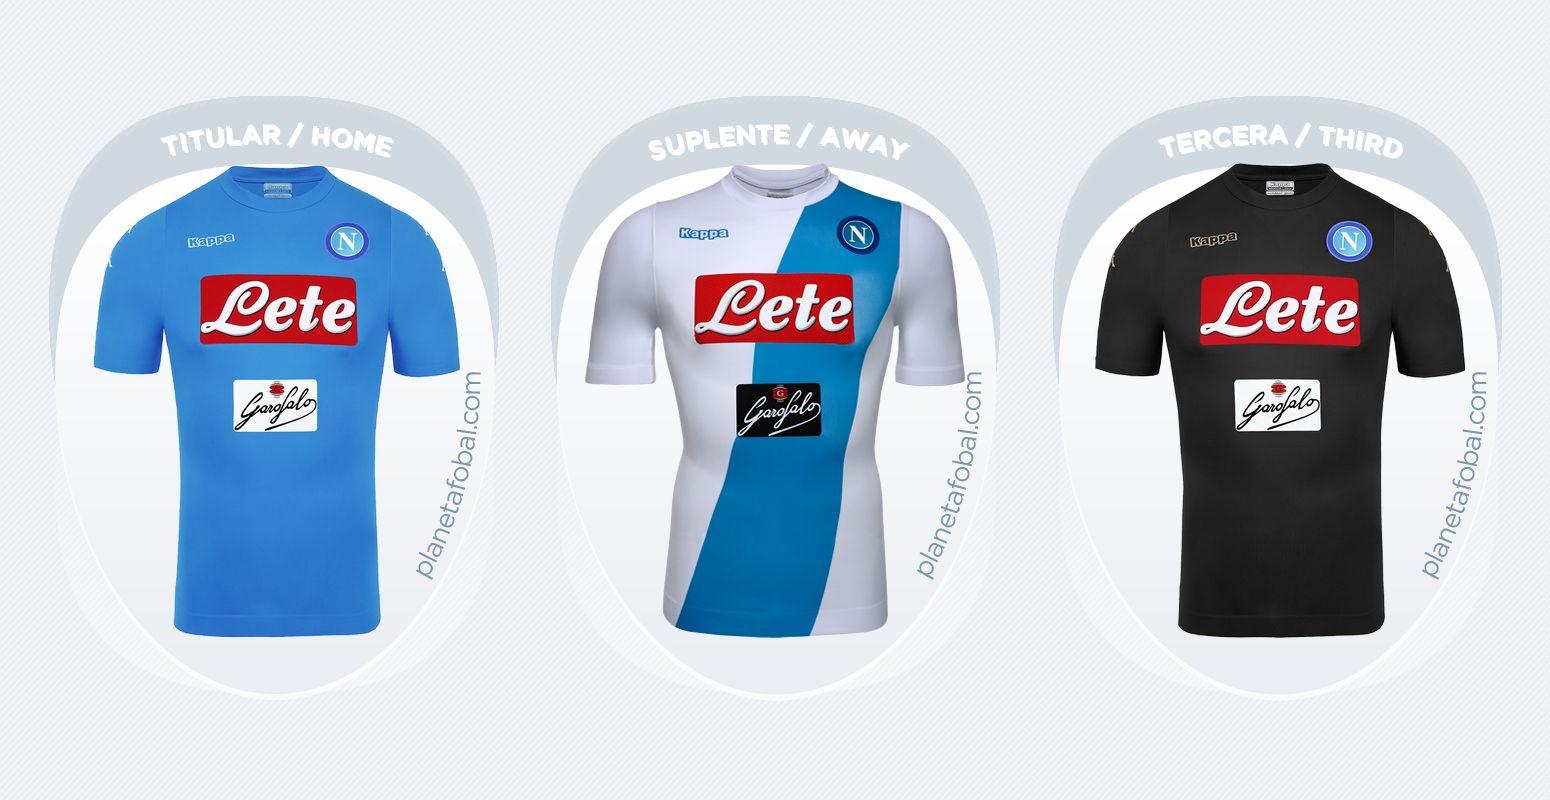 acf351b6ac76b Camisetas de la Serie A 2016 17